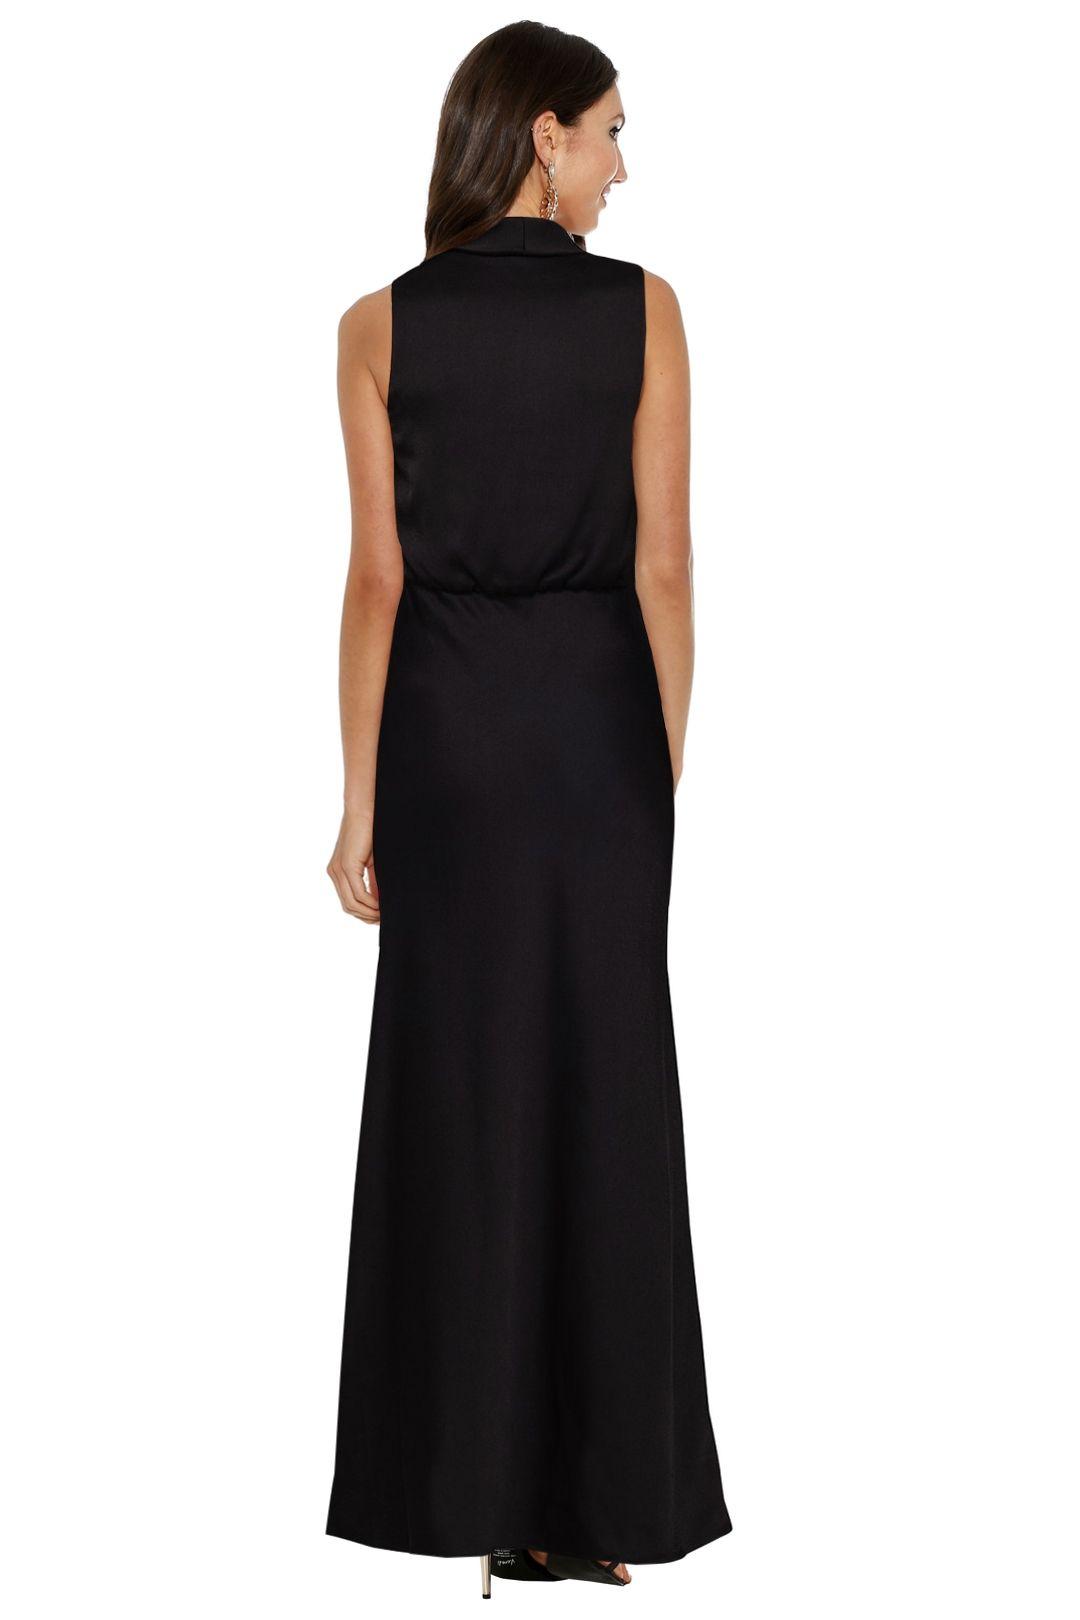 Camilla and Marc - Dahlia Dress - Black - Back